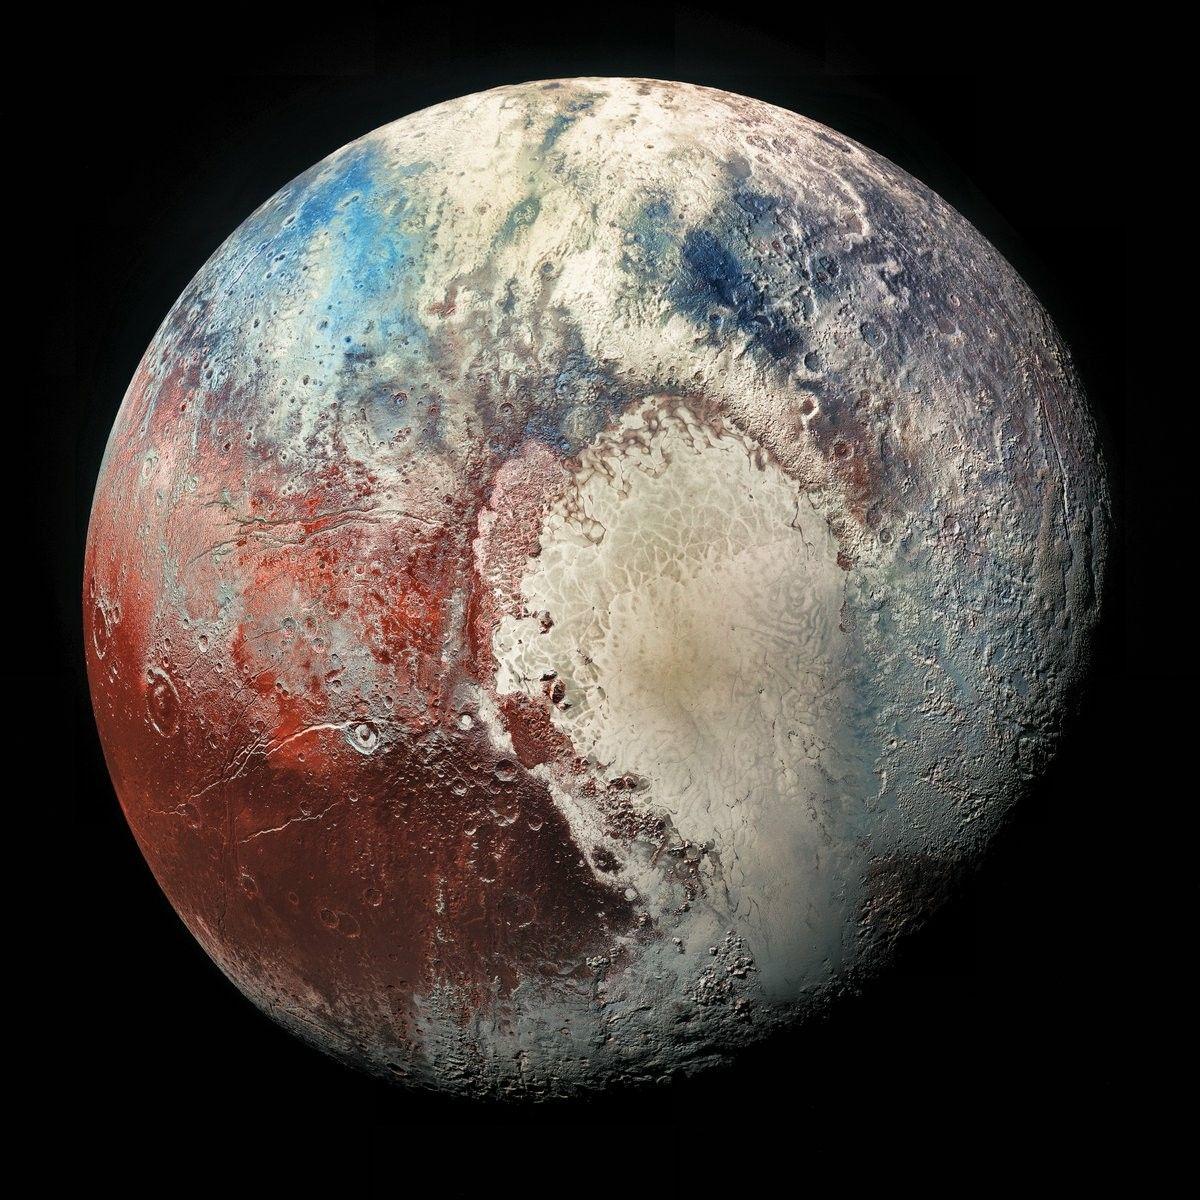 Wallpaper Galaxie D Andromède: Pin De Hasan Egemen Badur En Celestial